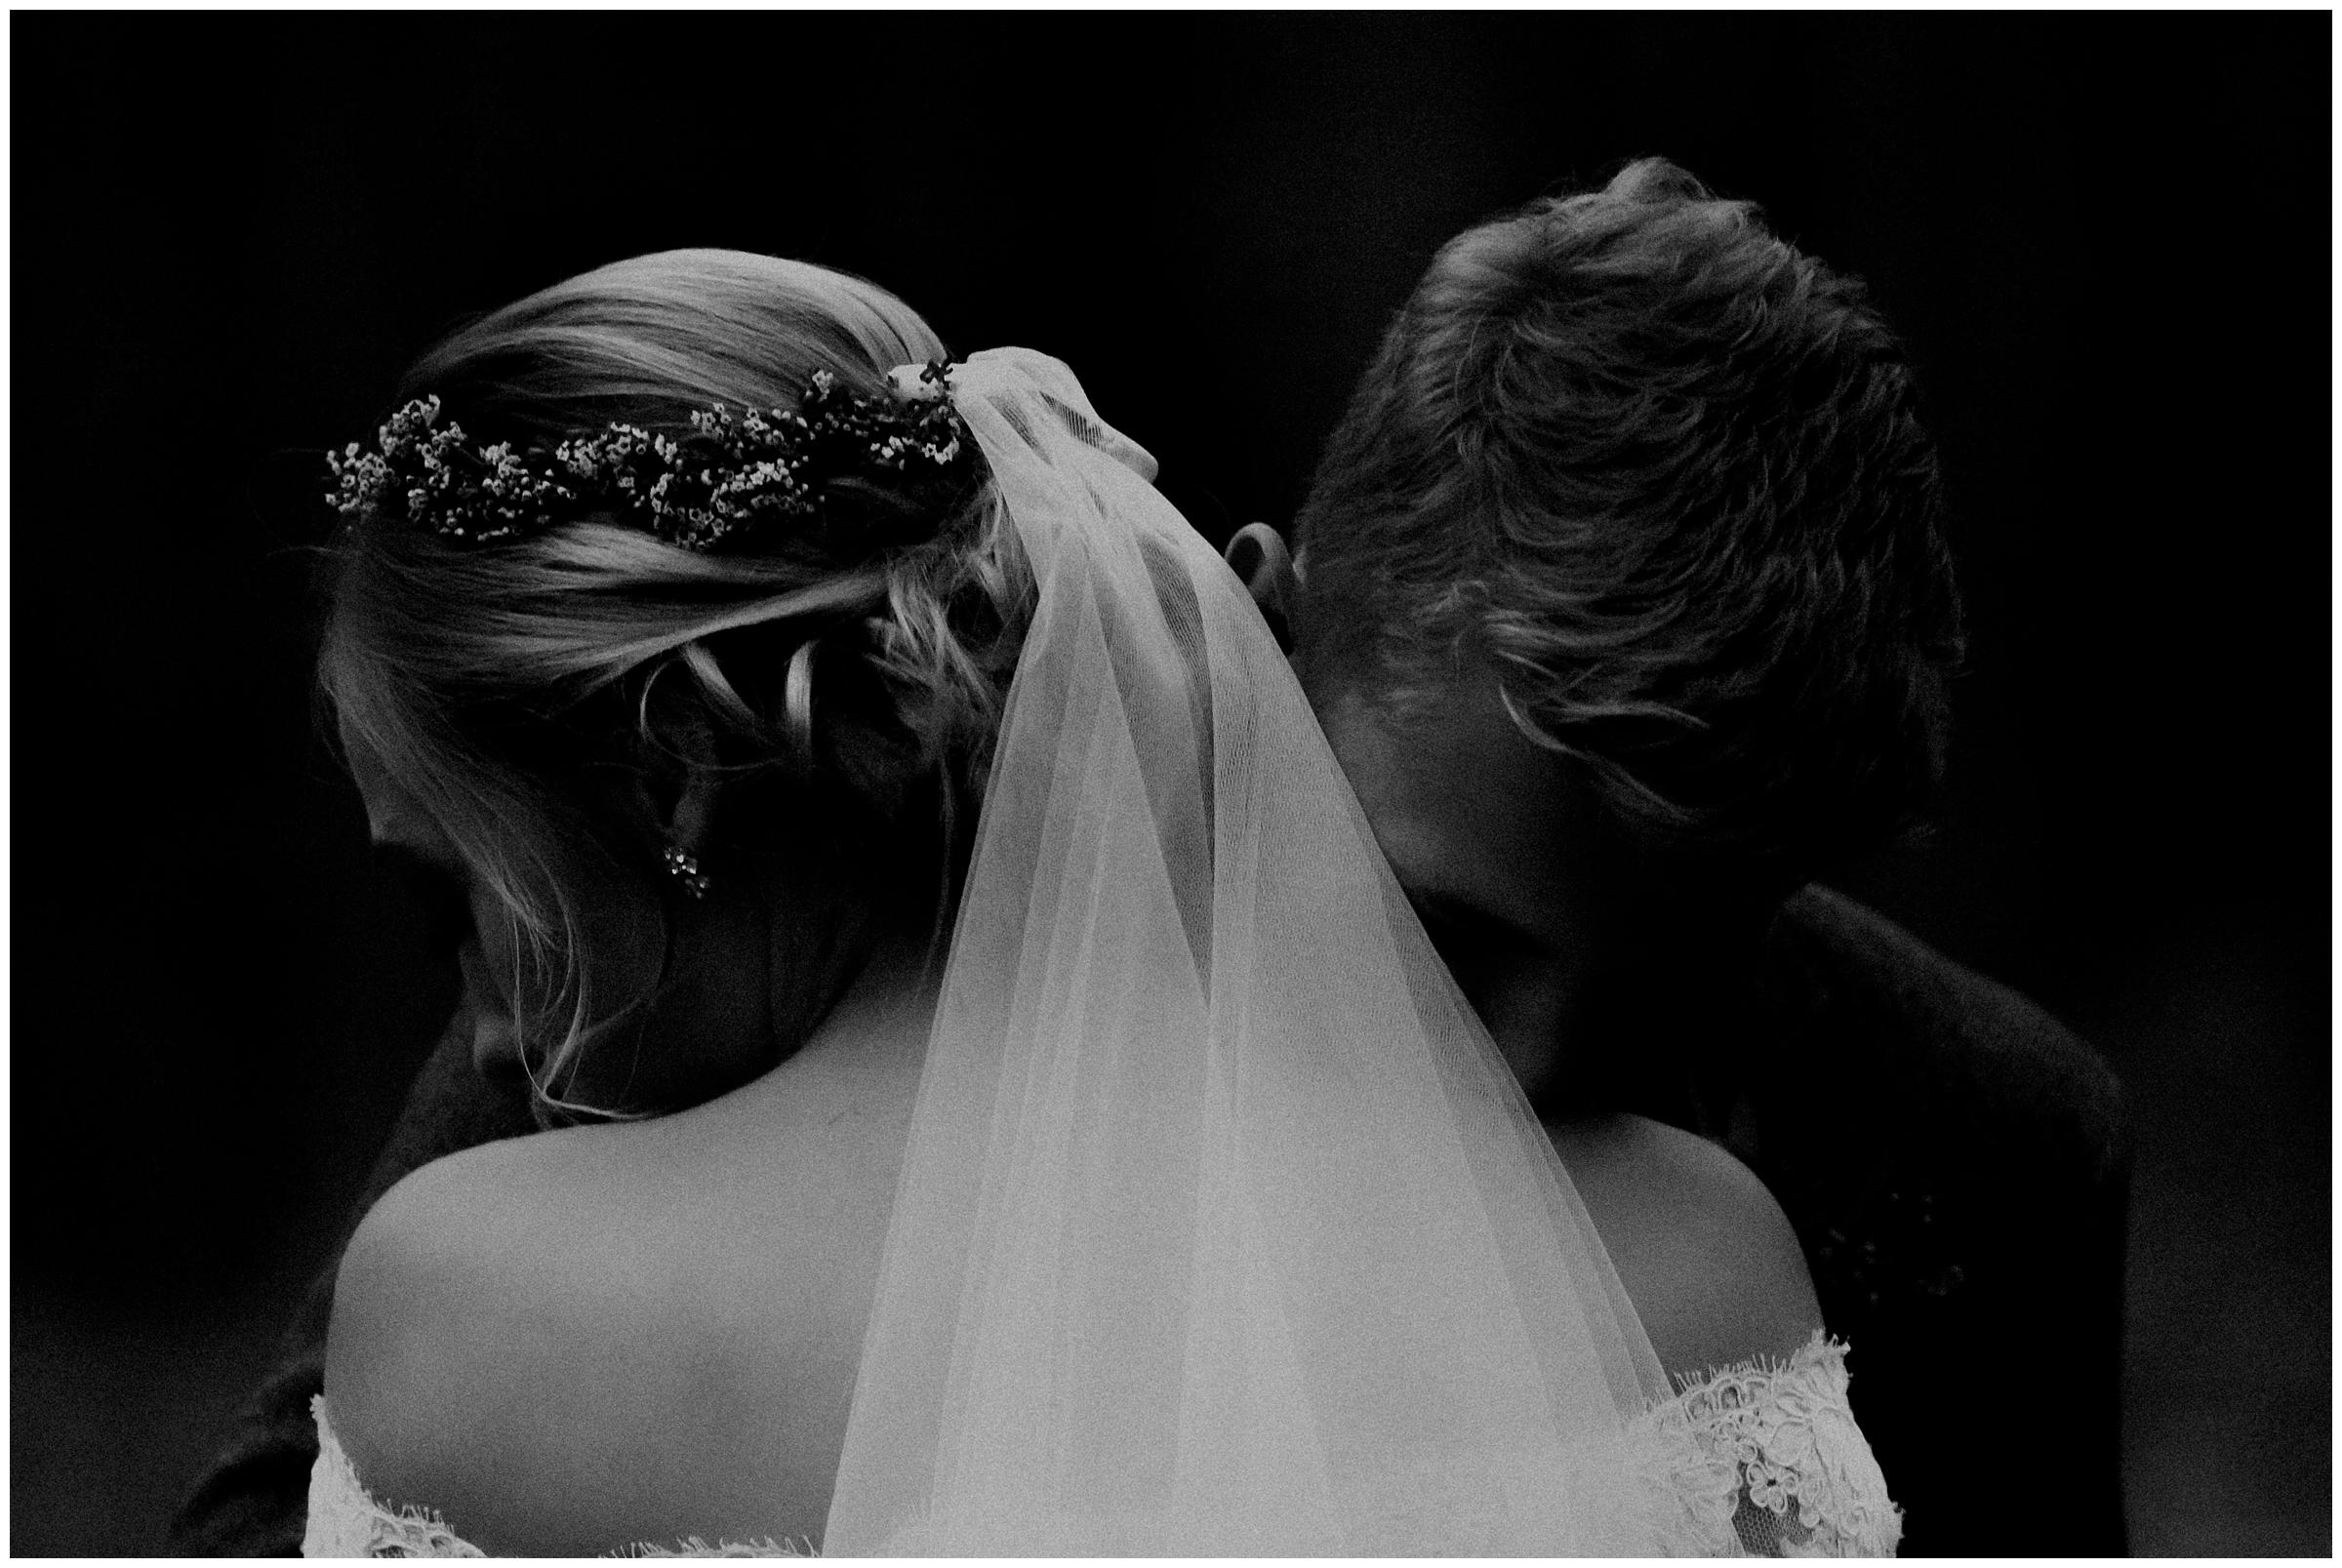 emotive photo of bride and groom